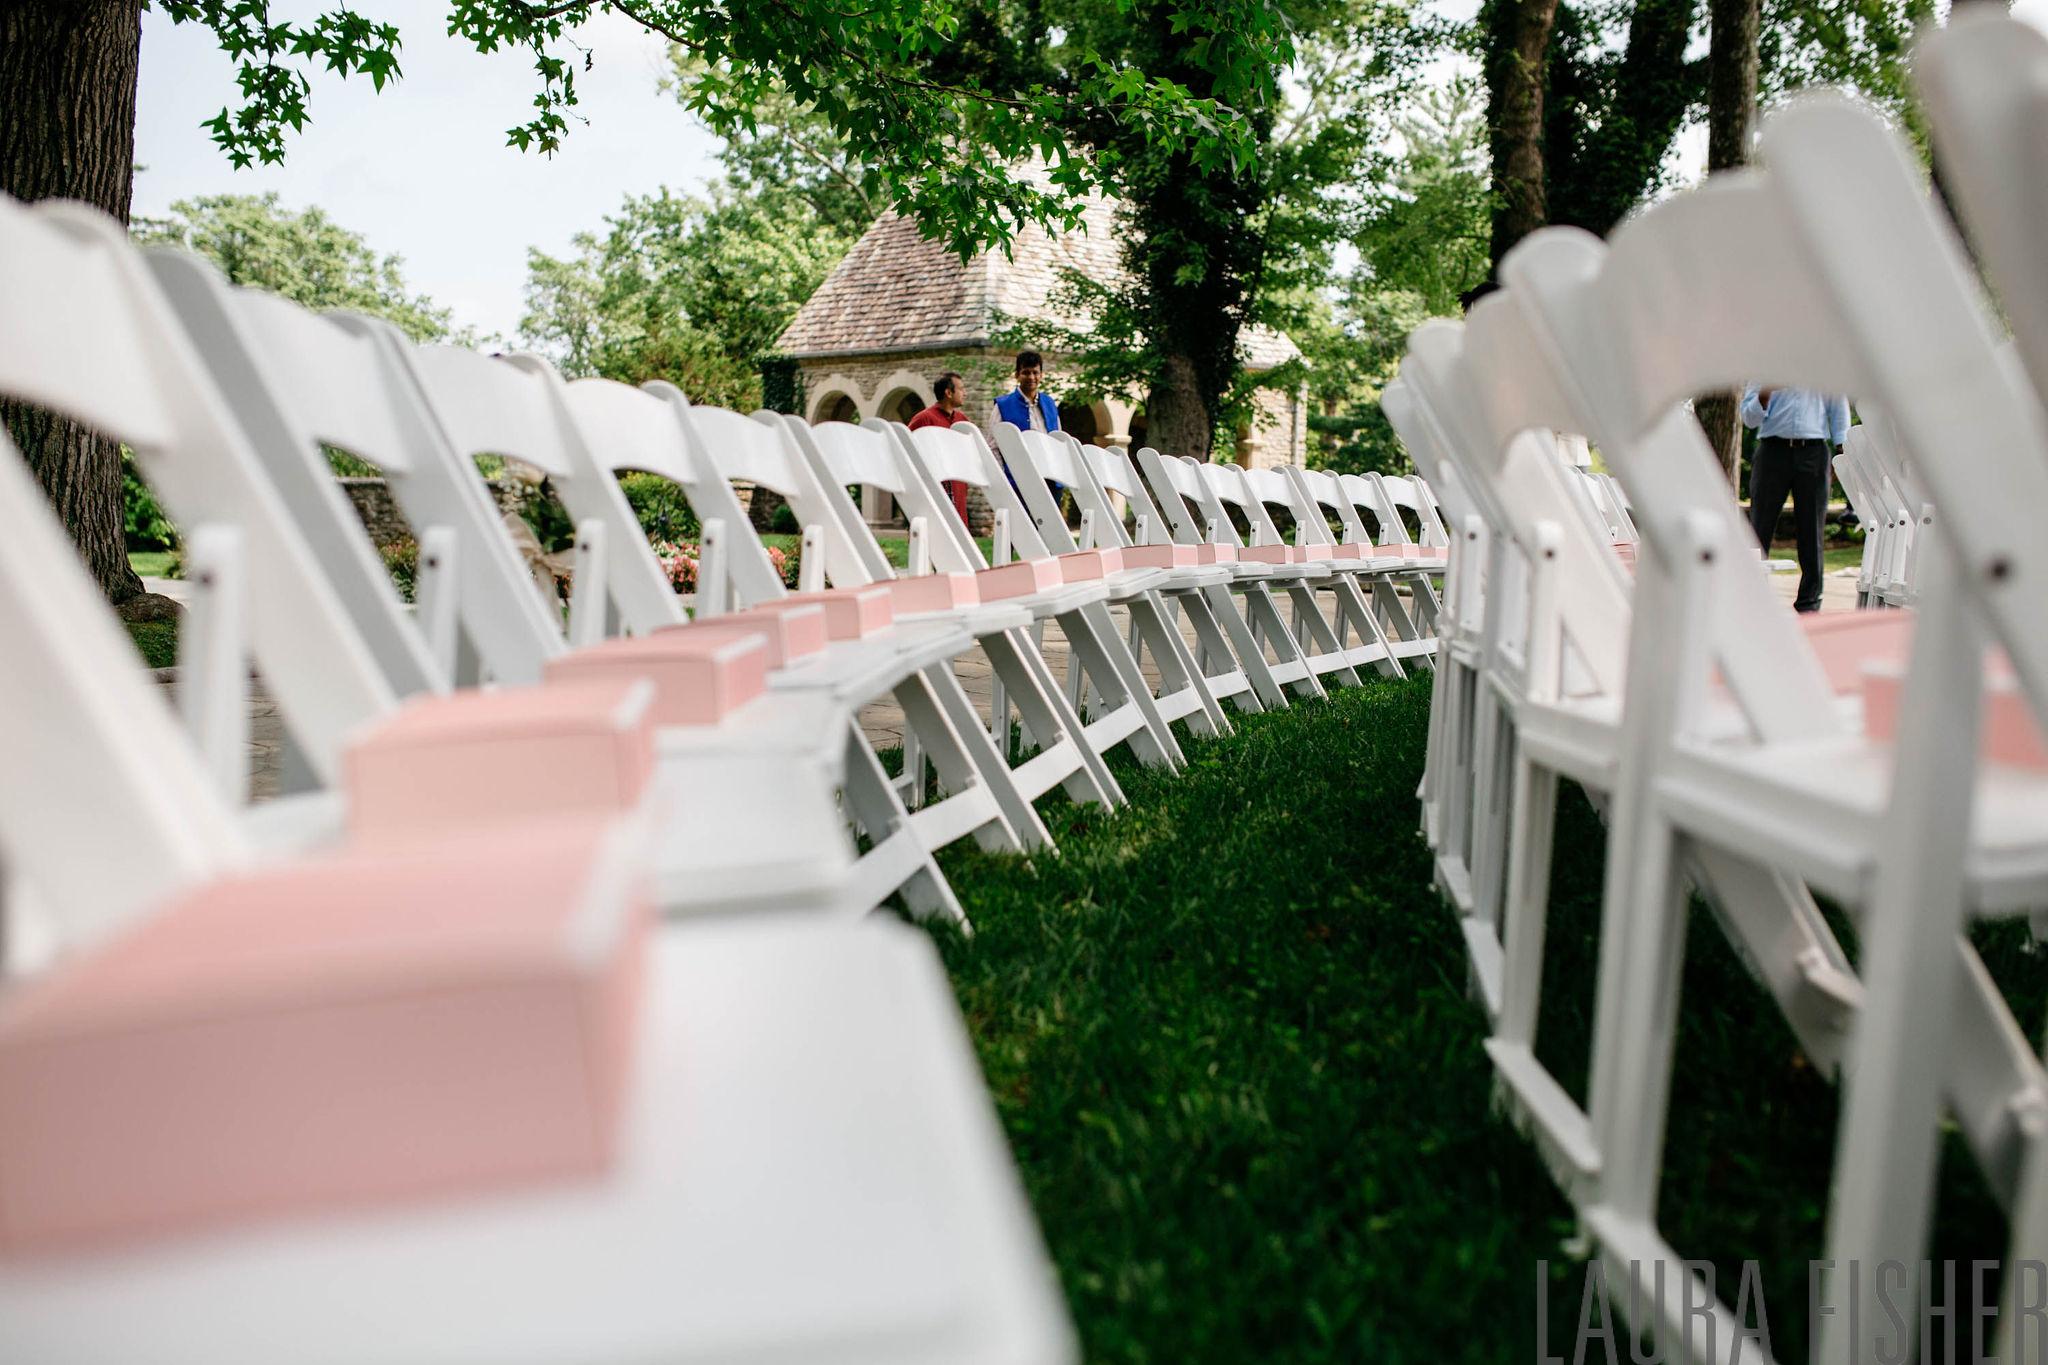 greenacres-wedding-ceremony-wedding-planner.jpg